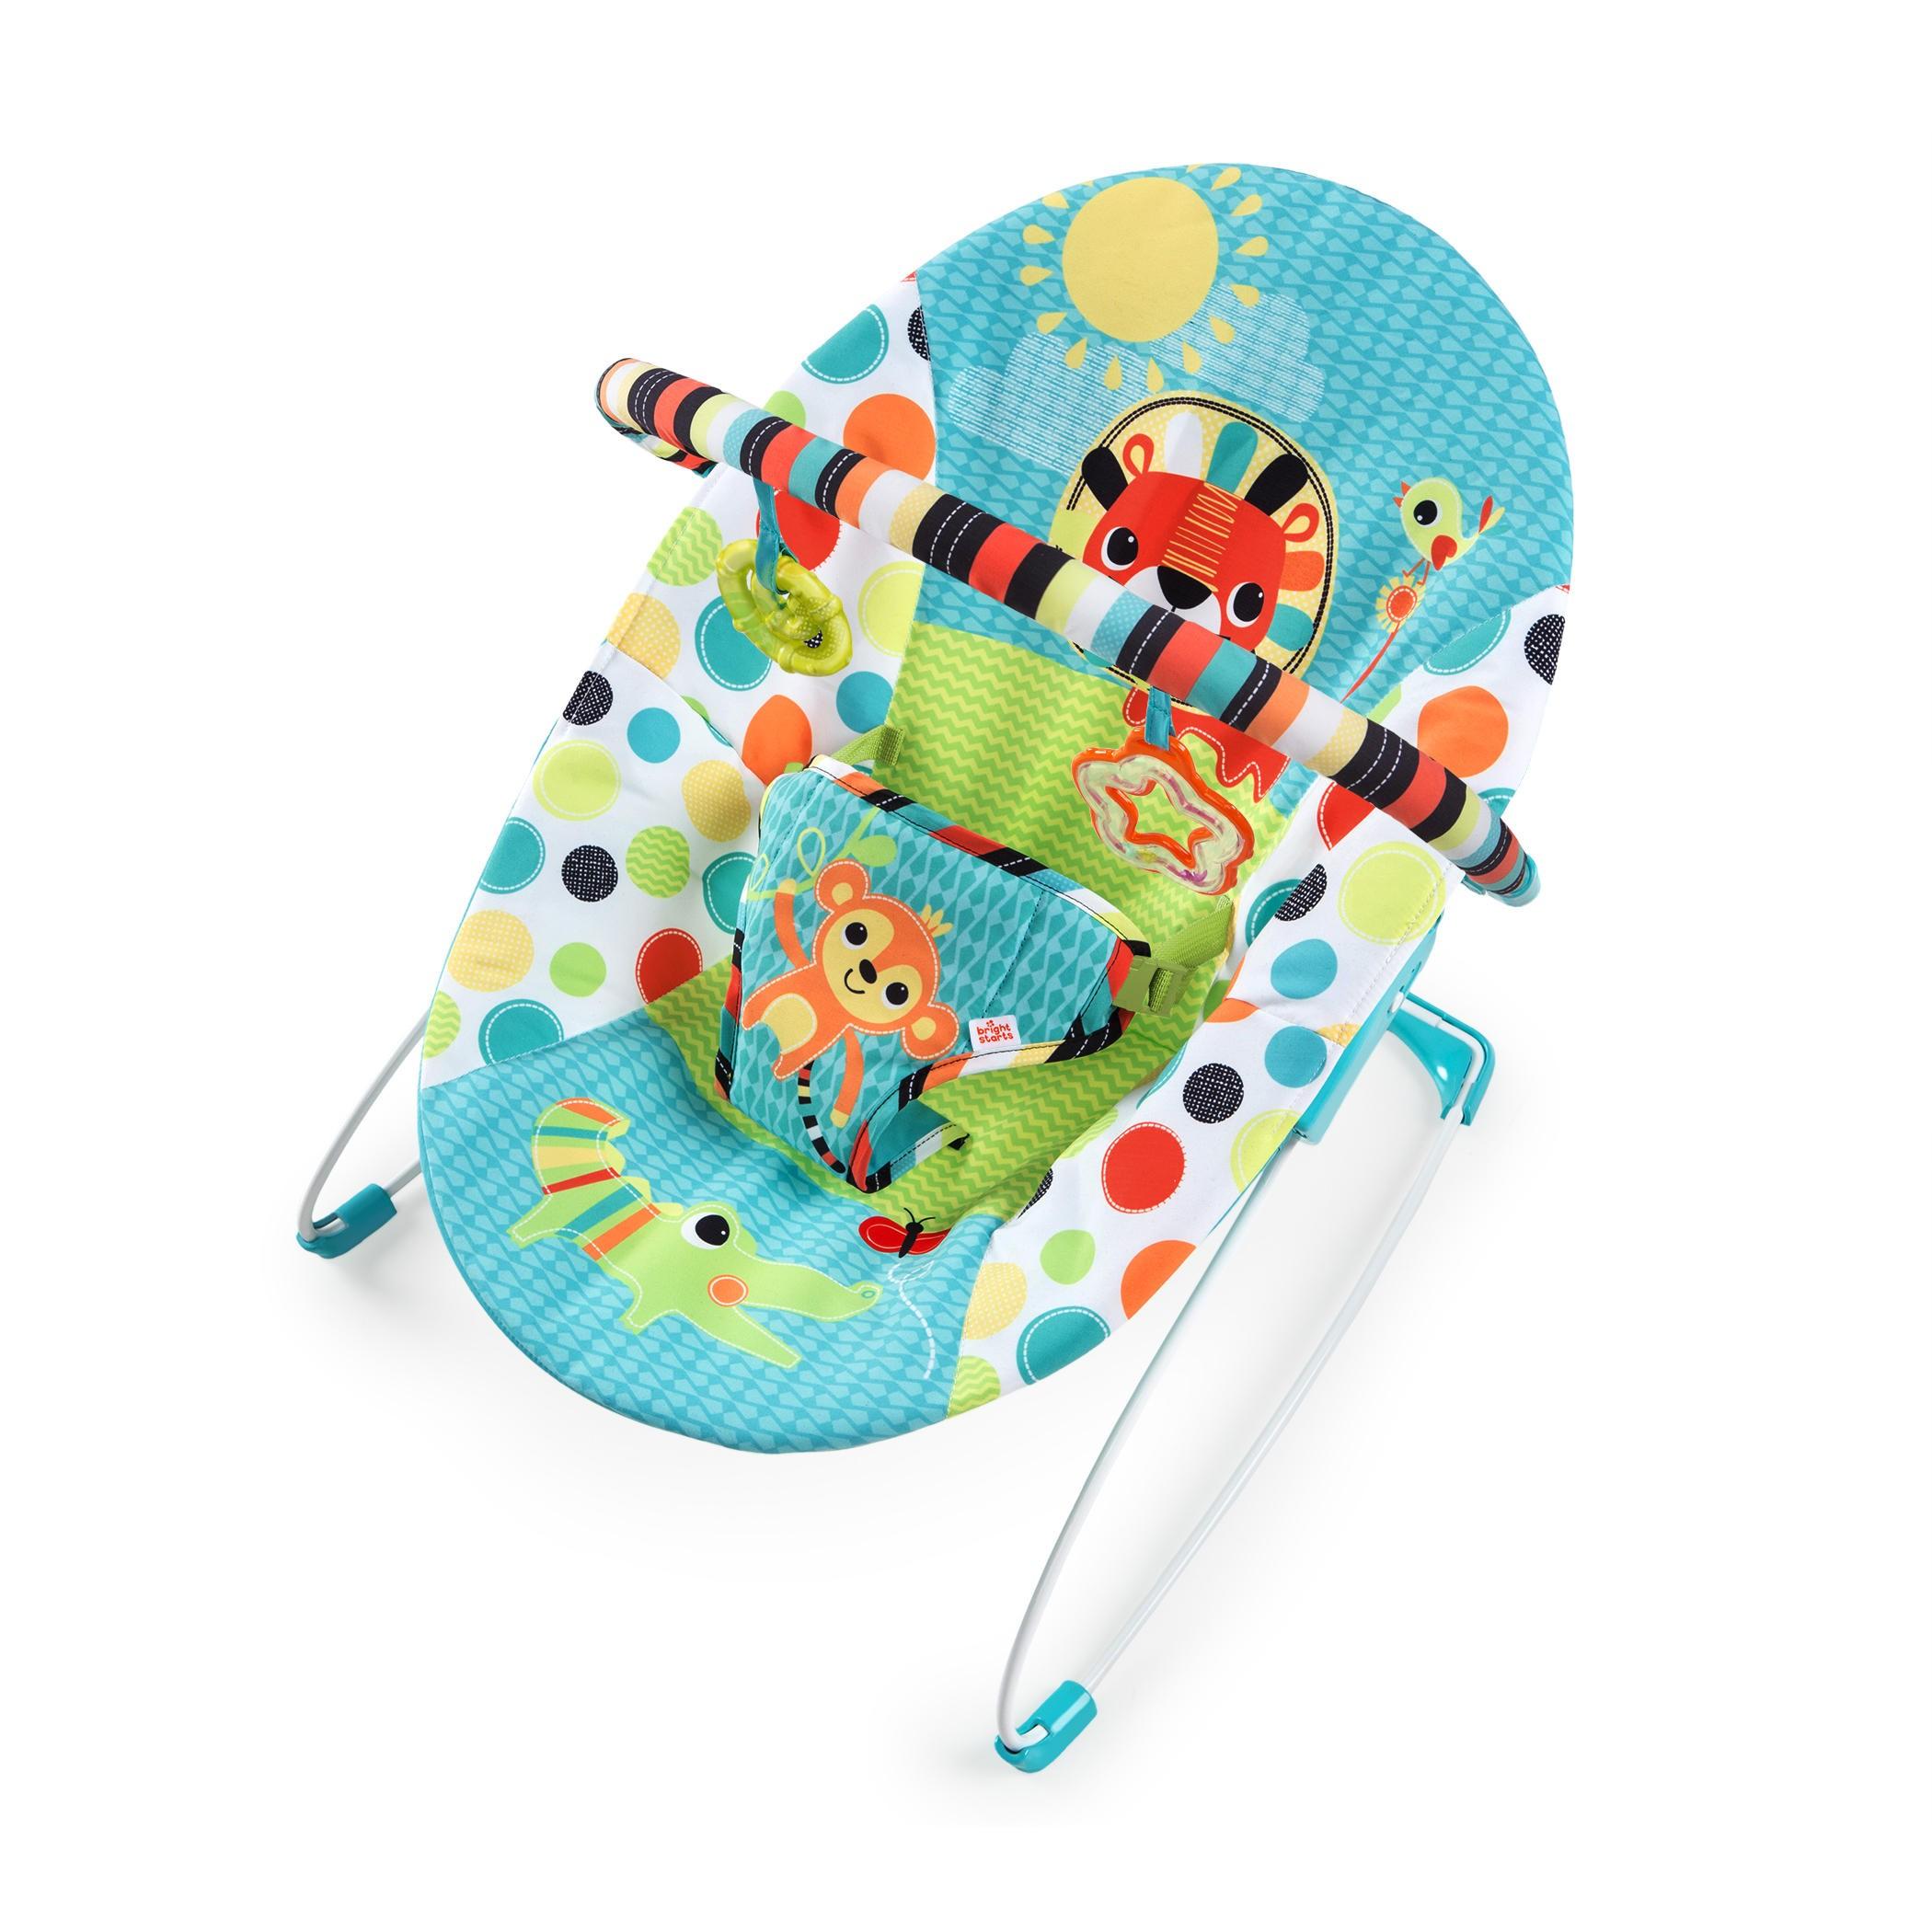 dc64b9755 BabyCity - Todo para tu bebé, Cochecitos de bebé, Sillas de Auto ...